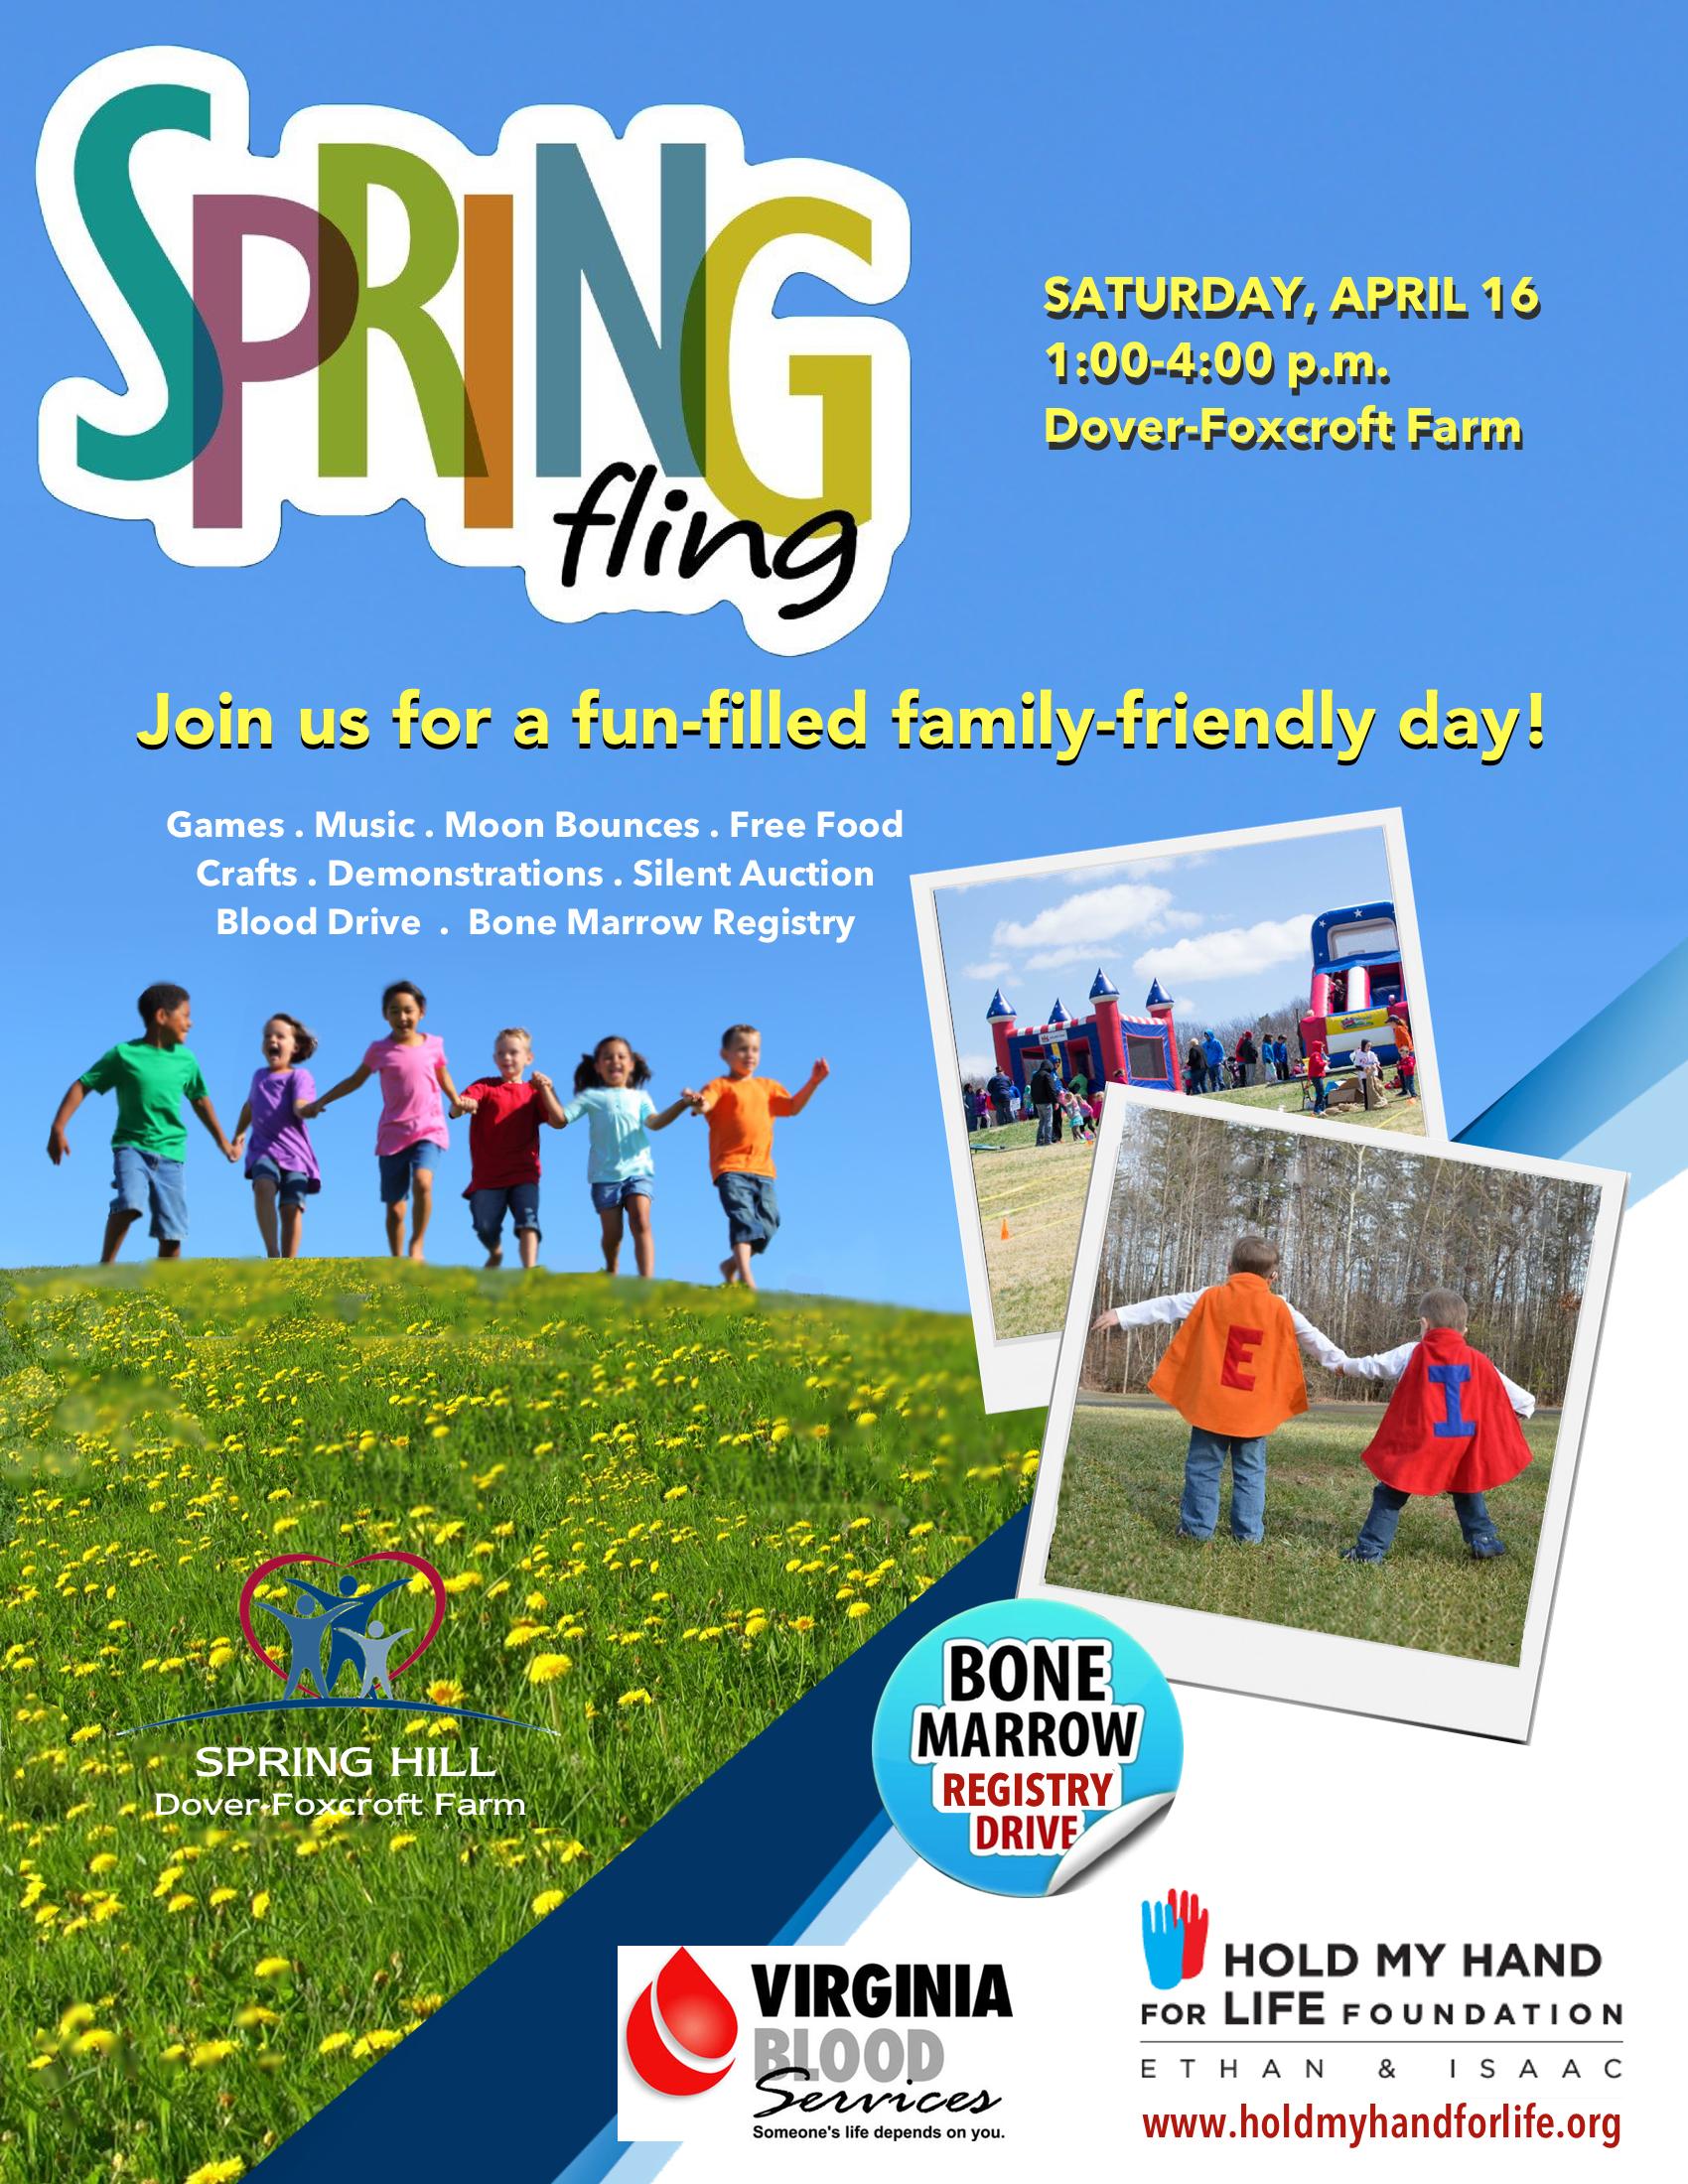 SpringFling-flyer 2016 Dover-Foxcroft